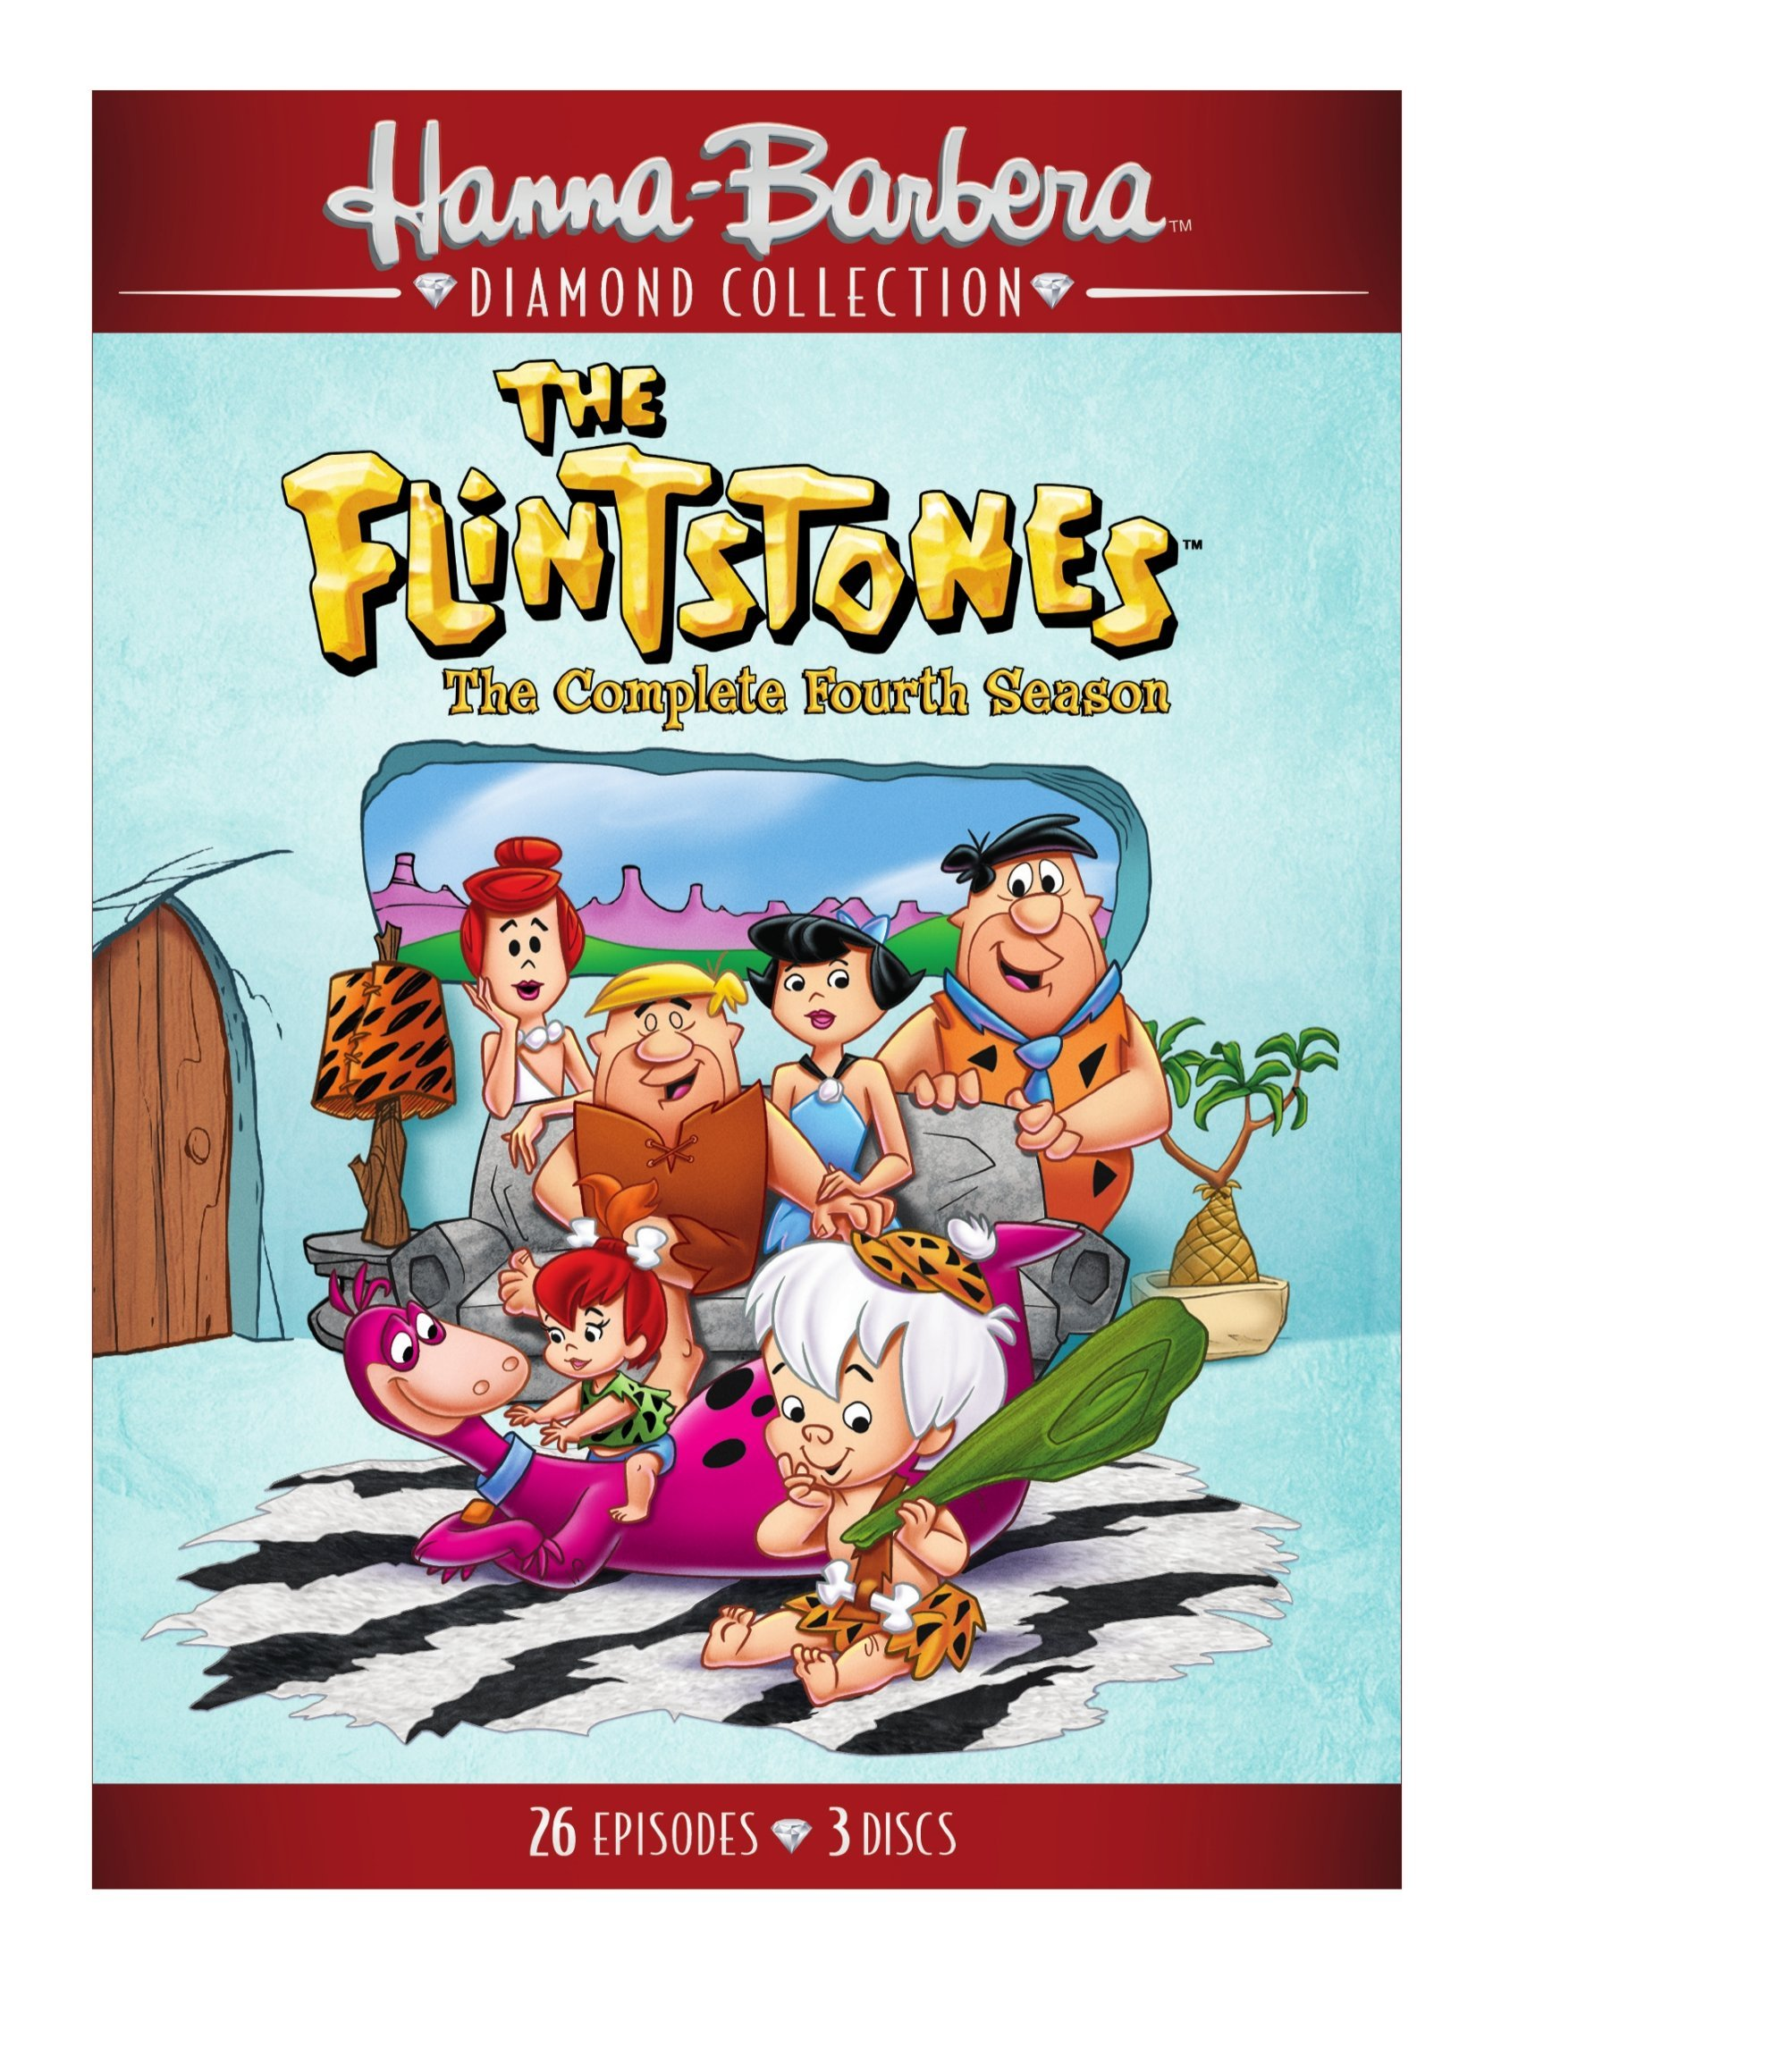 The Flintstones: The Complete Fourth Season